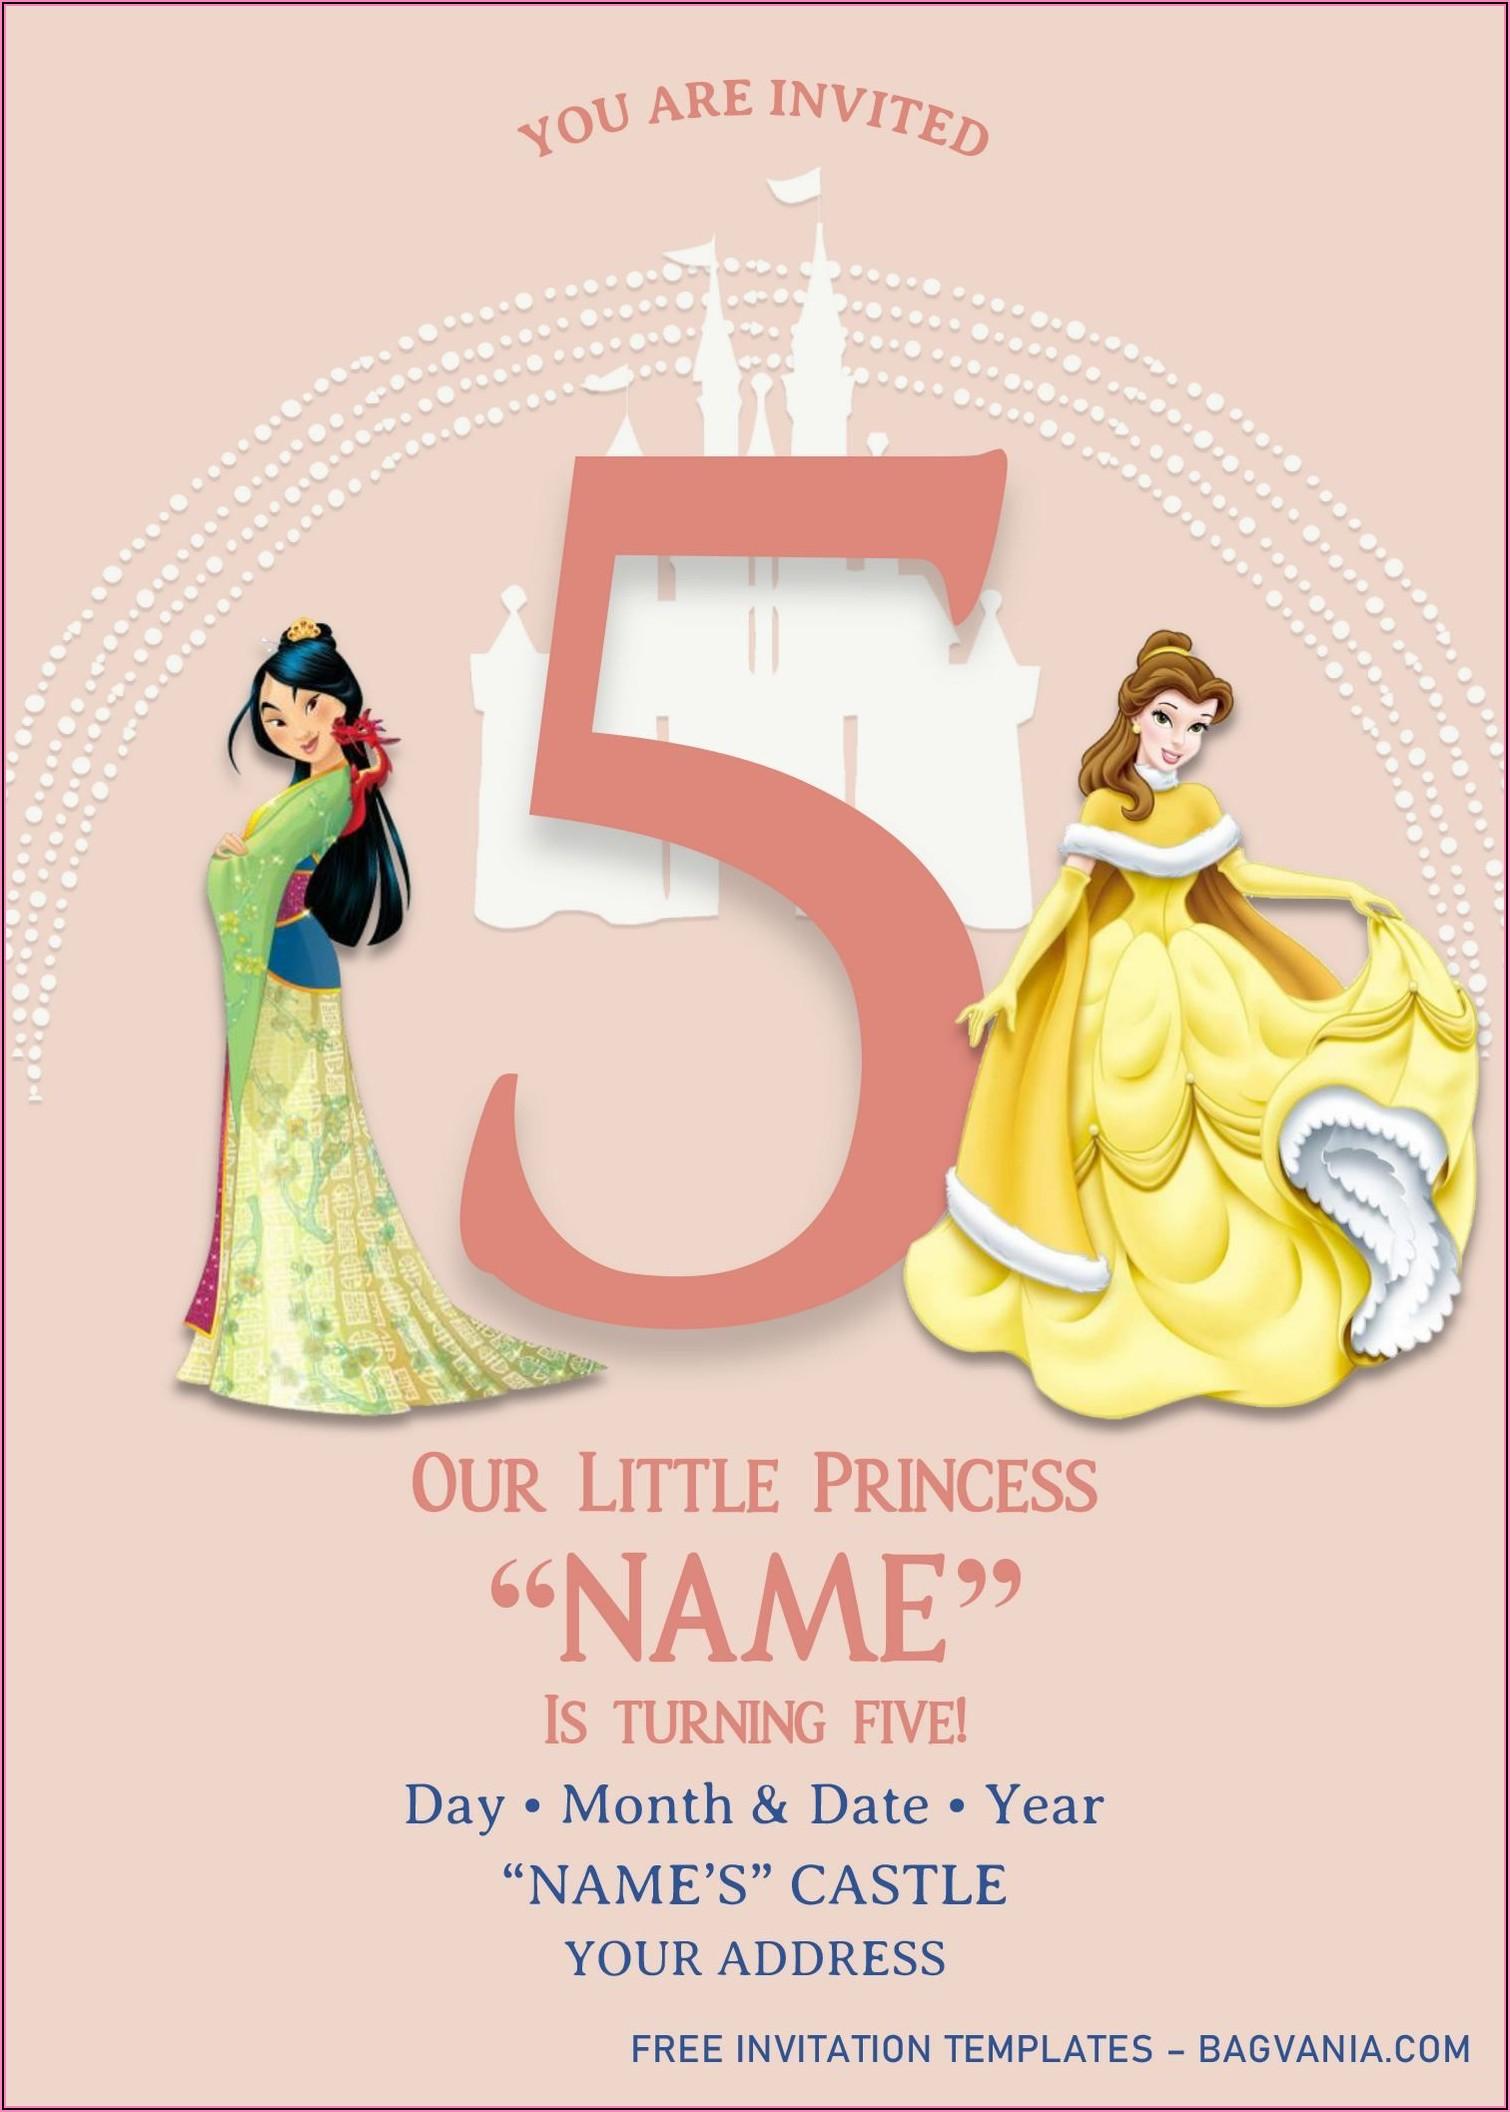 Free Editable Disney Princess Birthday Invitations